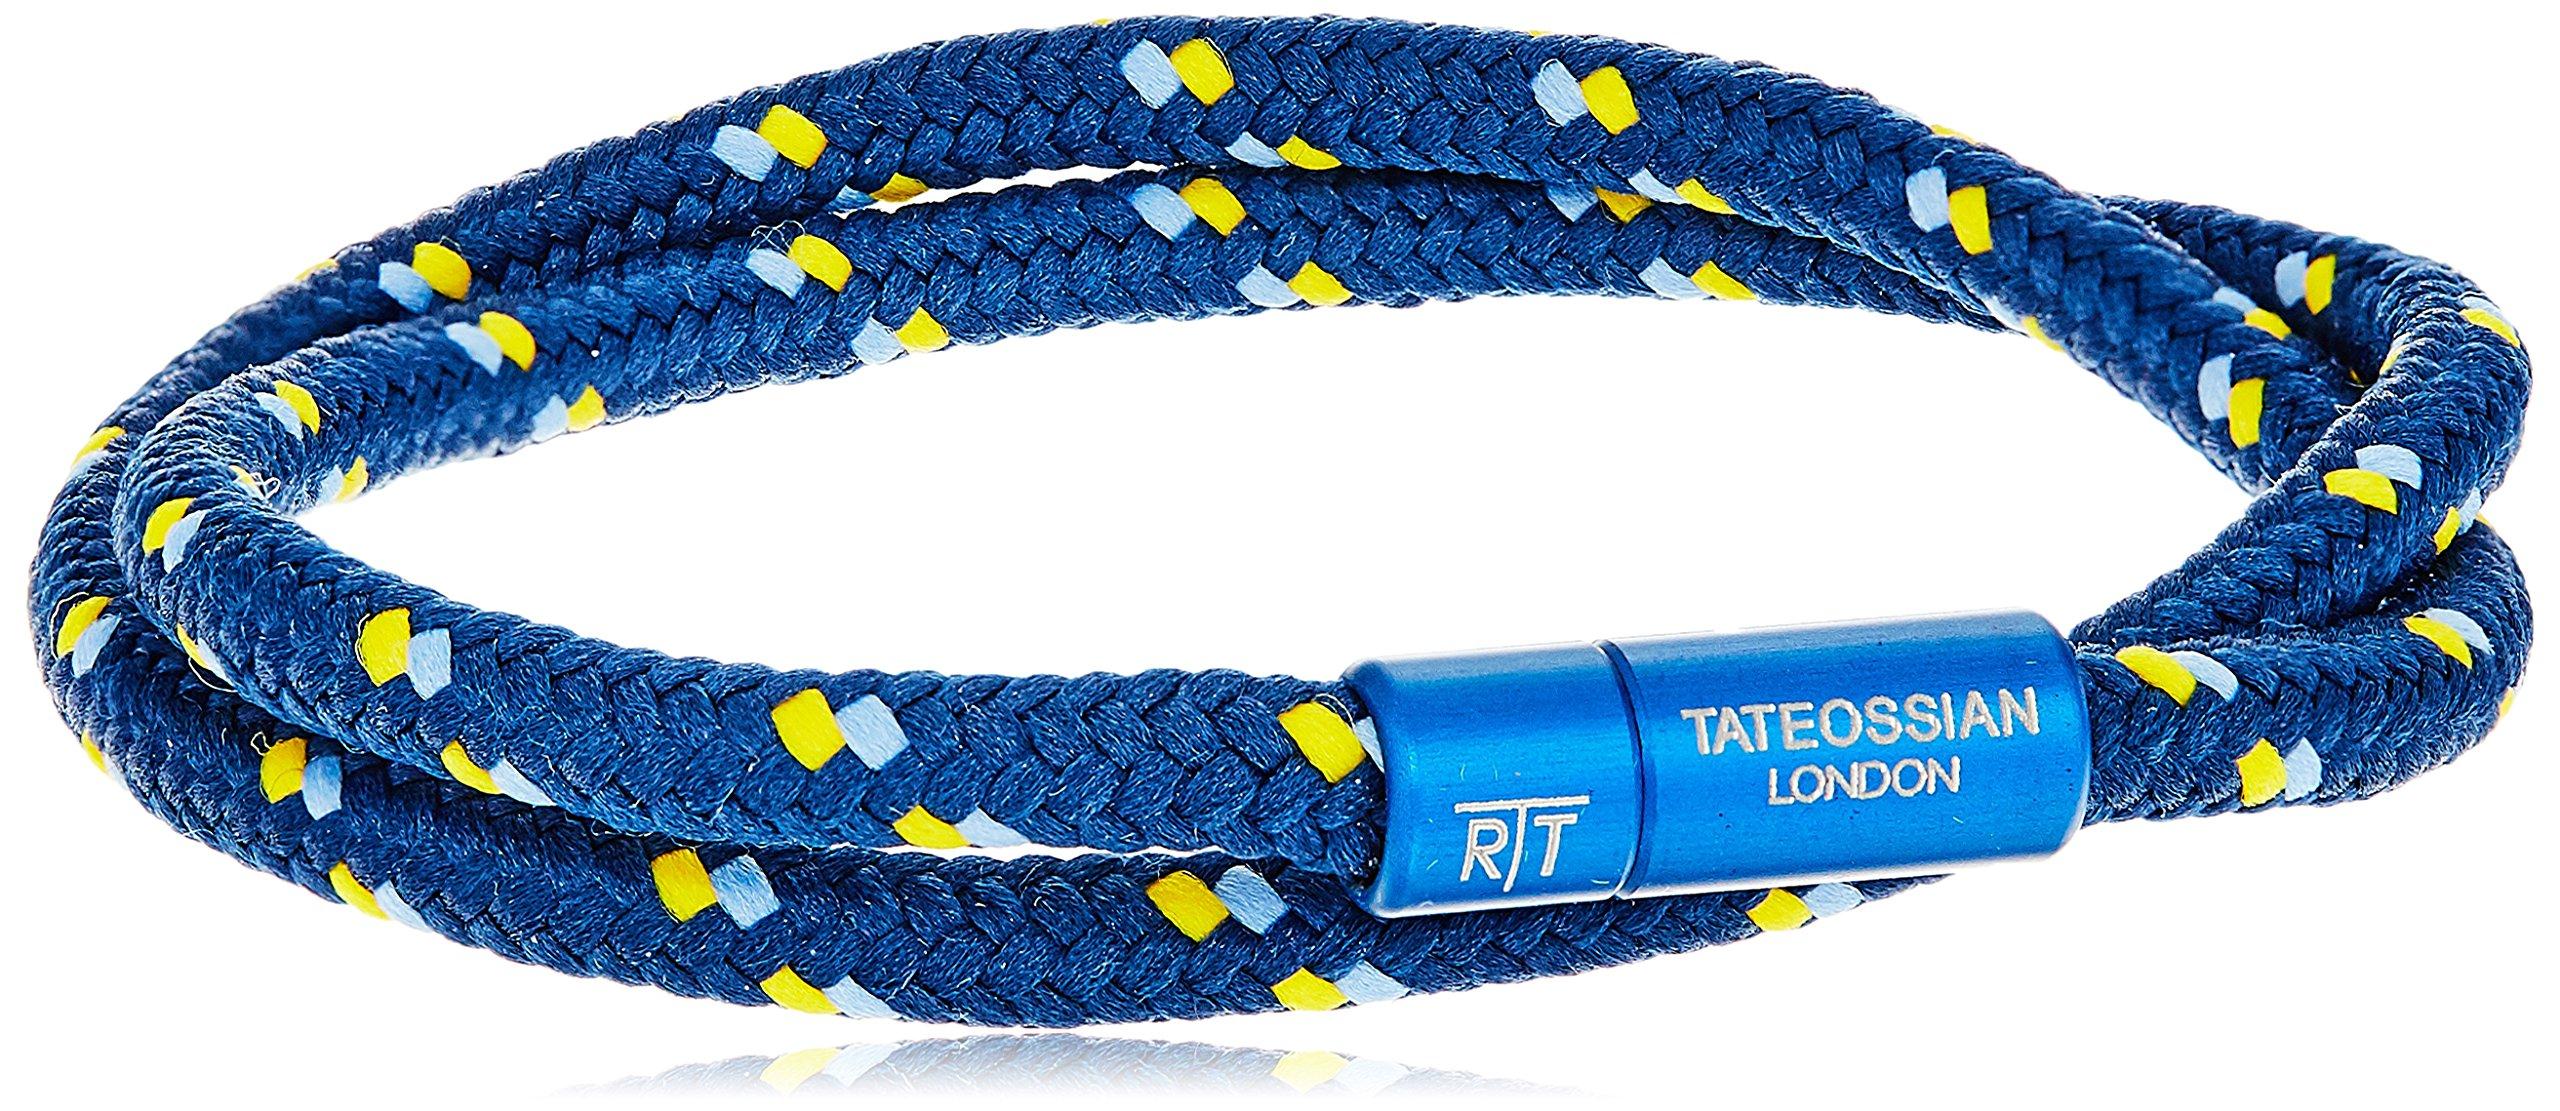 Tateossian Alum Nylon Blue 2 strand Shoelace Sport Blue Medium Bracelet